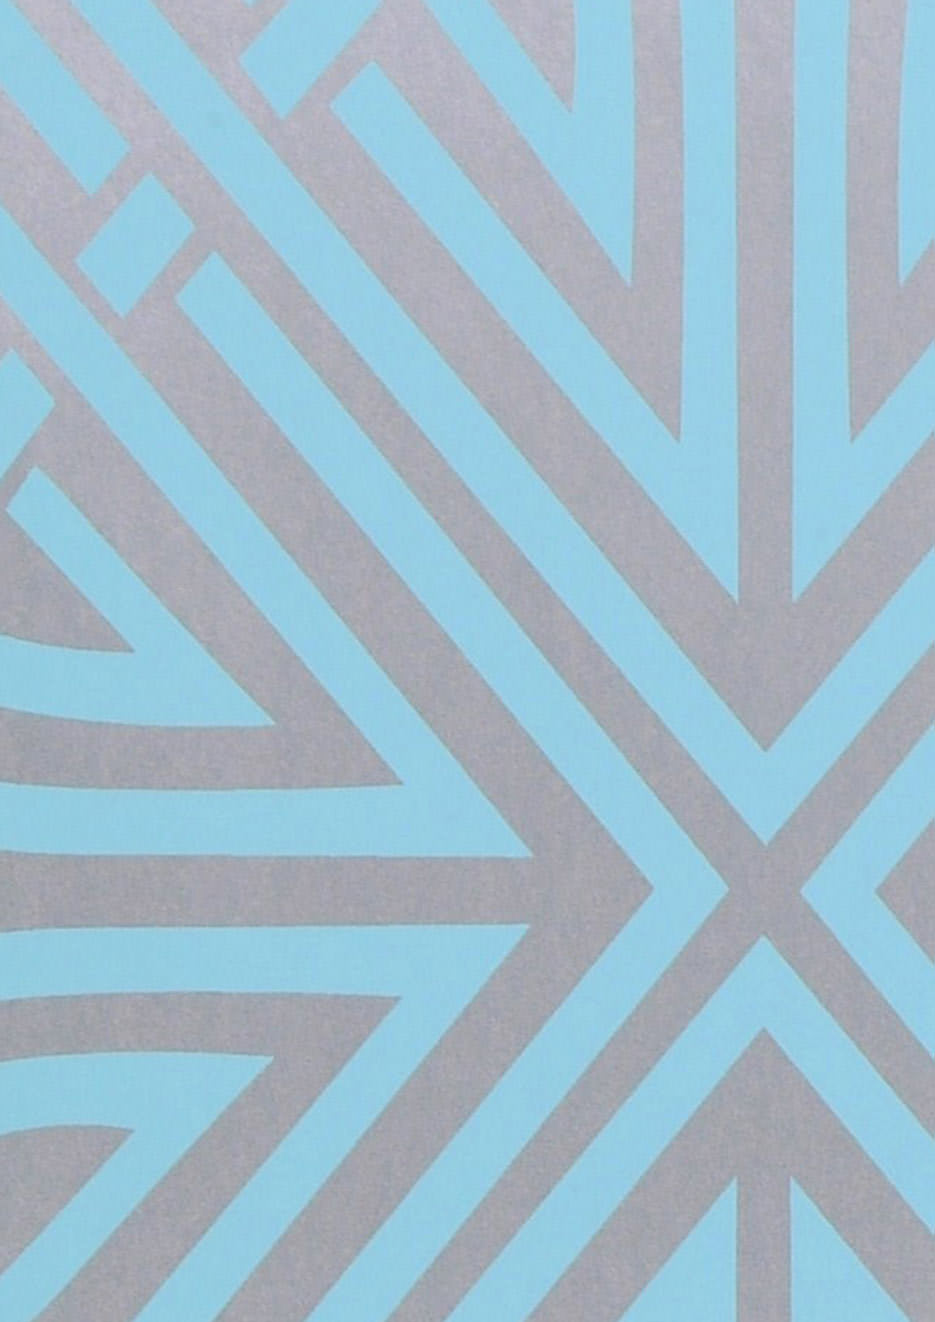 Papier peint chantico or blanc bleu turquoise papier peint des ann es 70 - Papier peint bleu turquoise ...